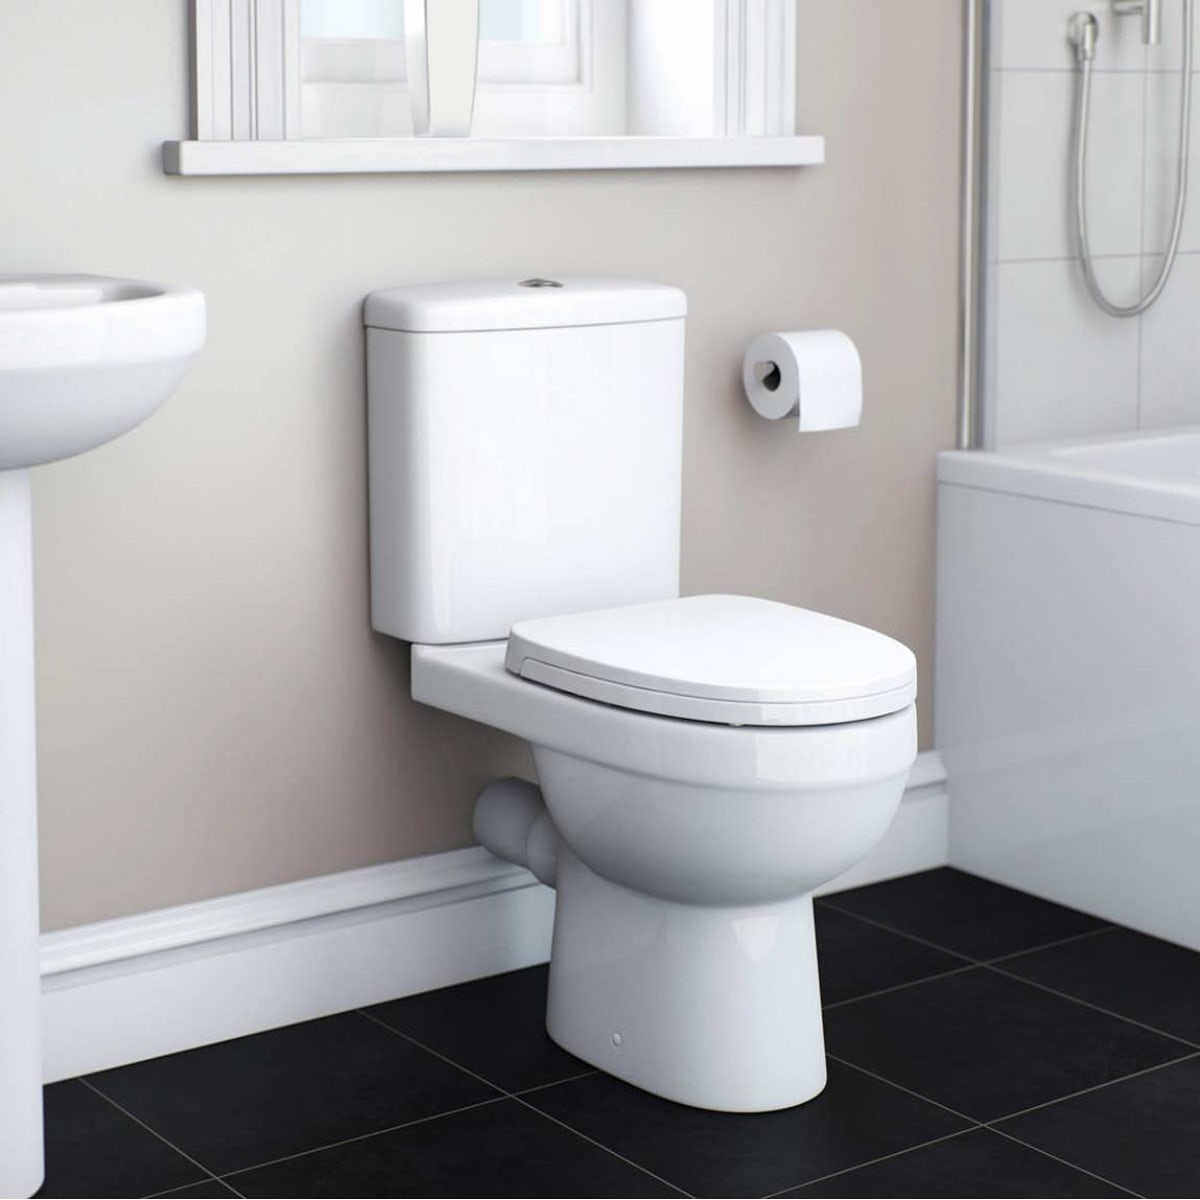 Energy bathroom set with 1200x800 sliding enclosure tray for Bathroom tray set